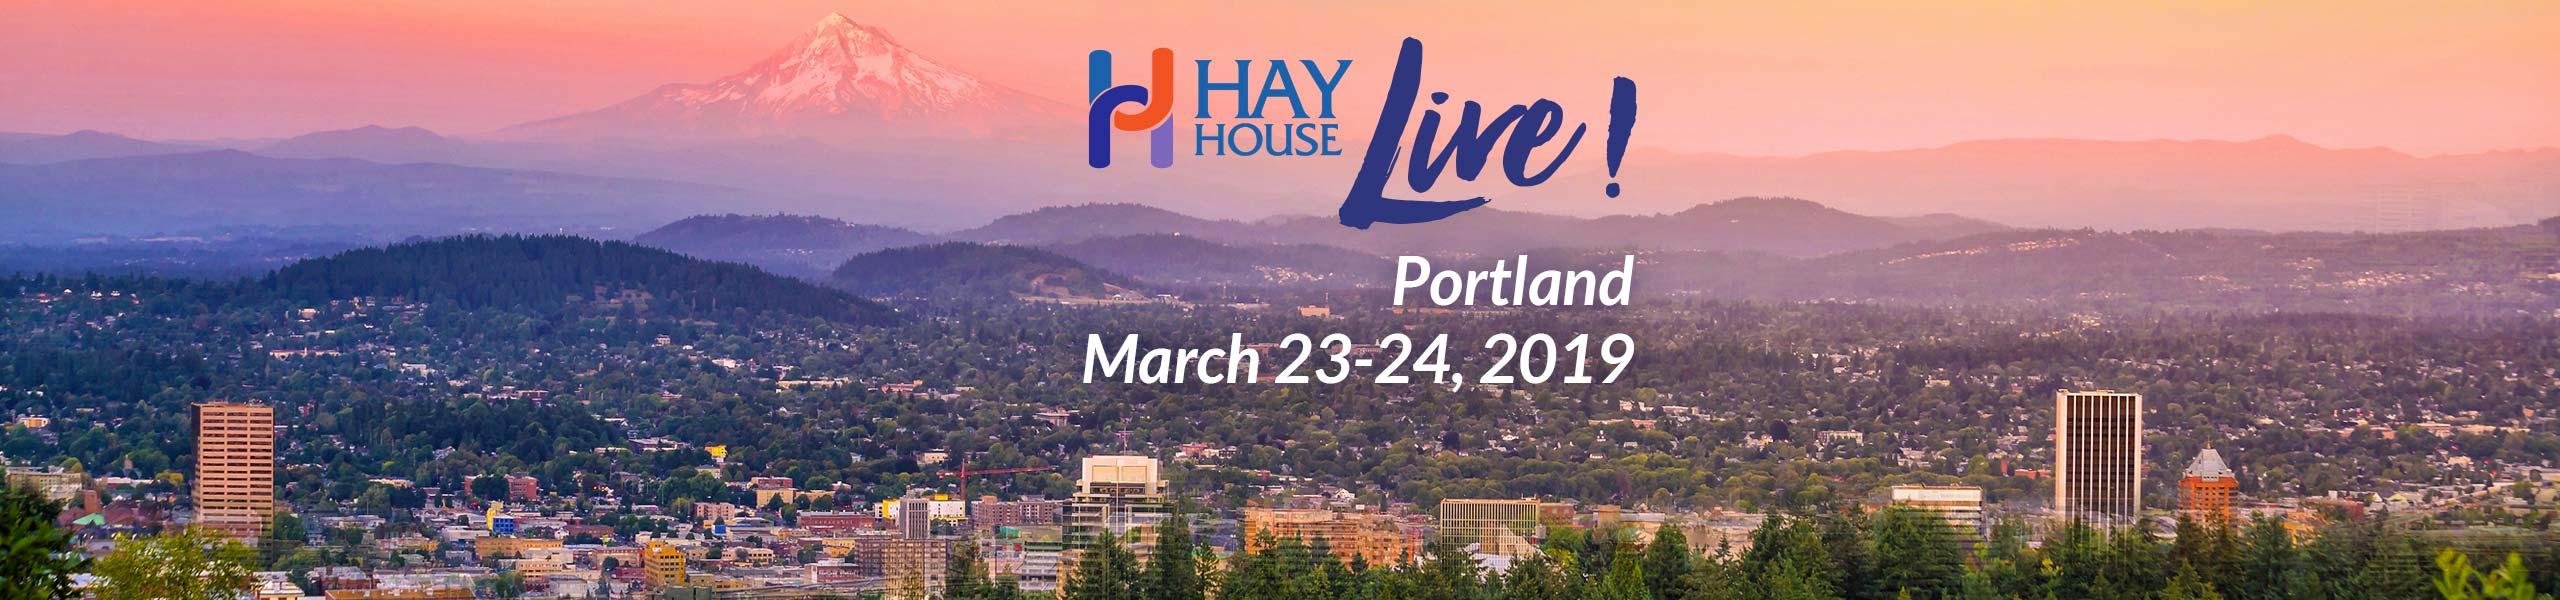 Hay House Live! Portland 2019 - John Holland